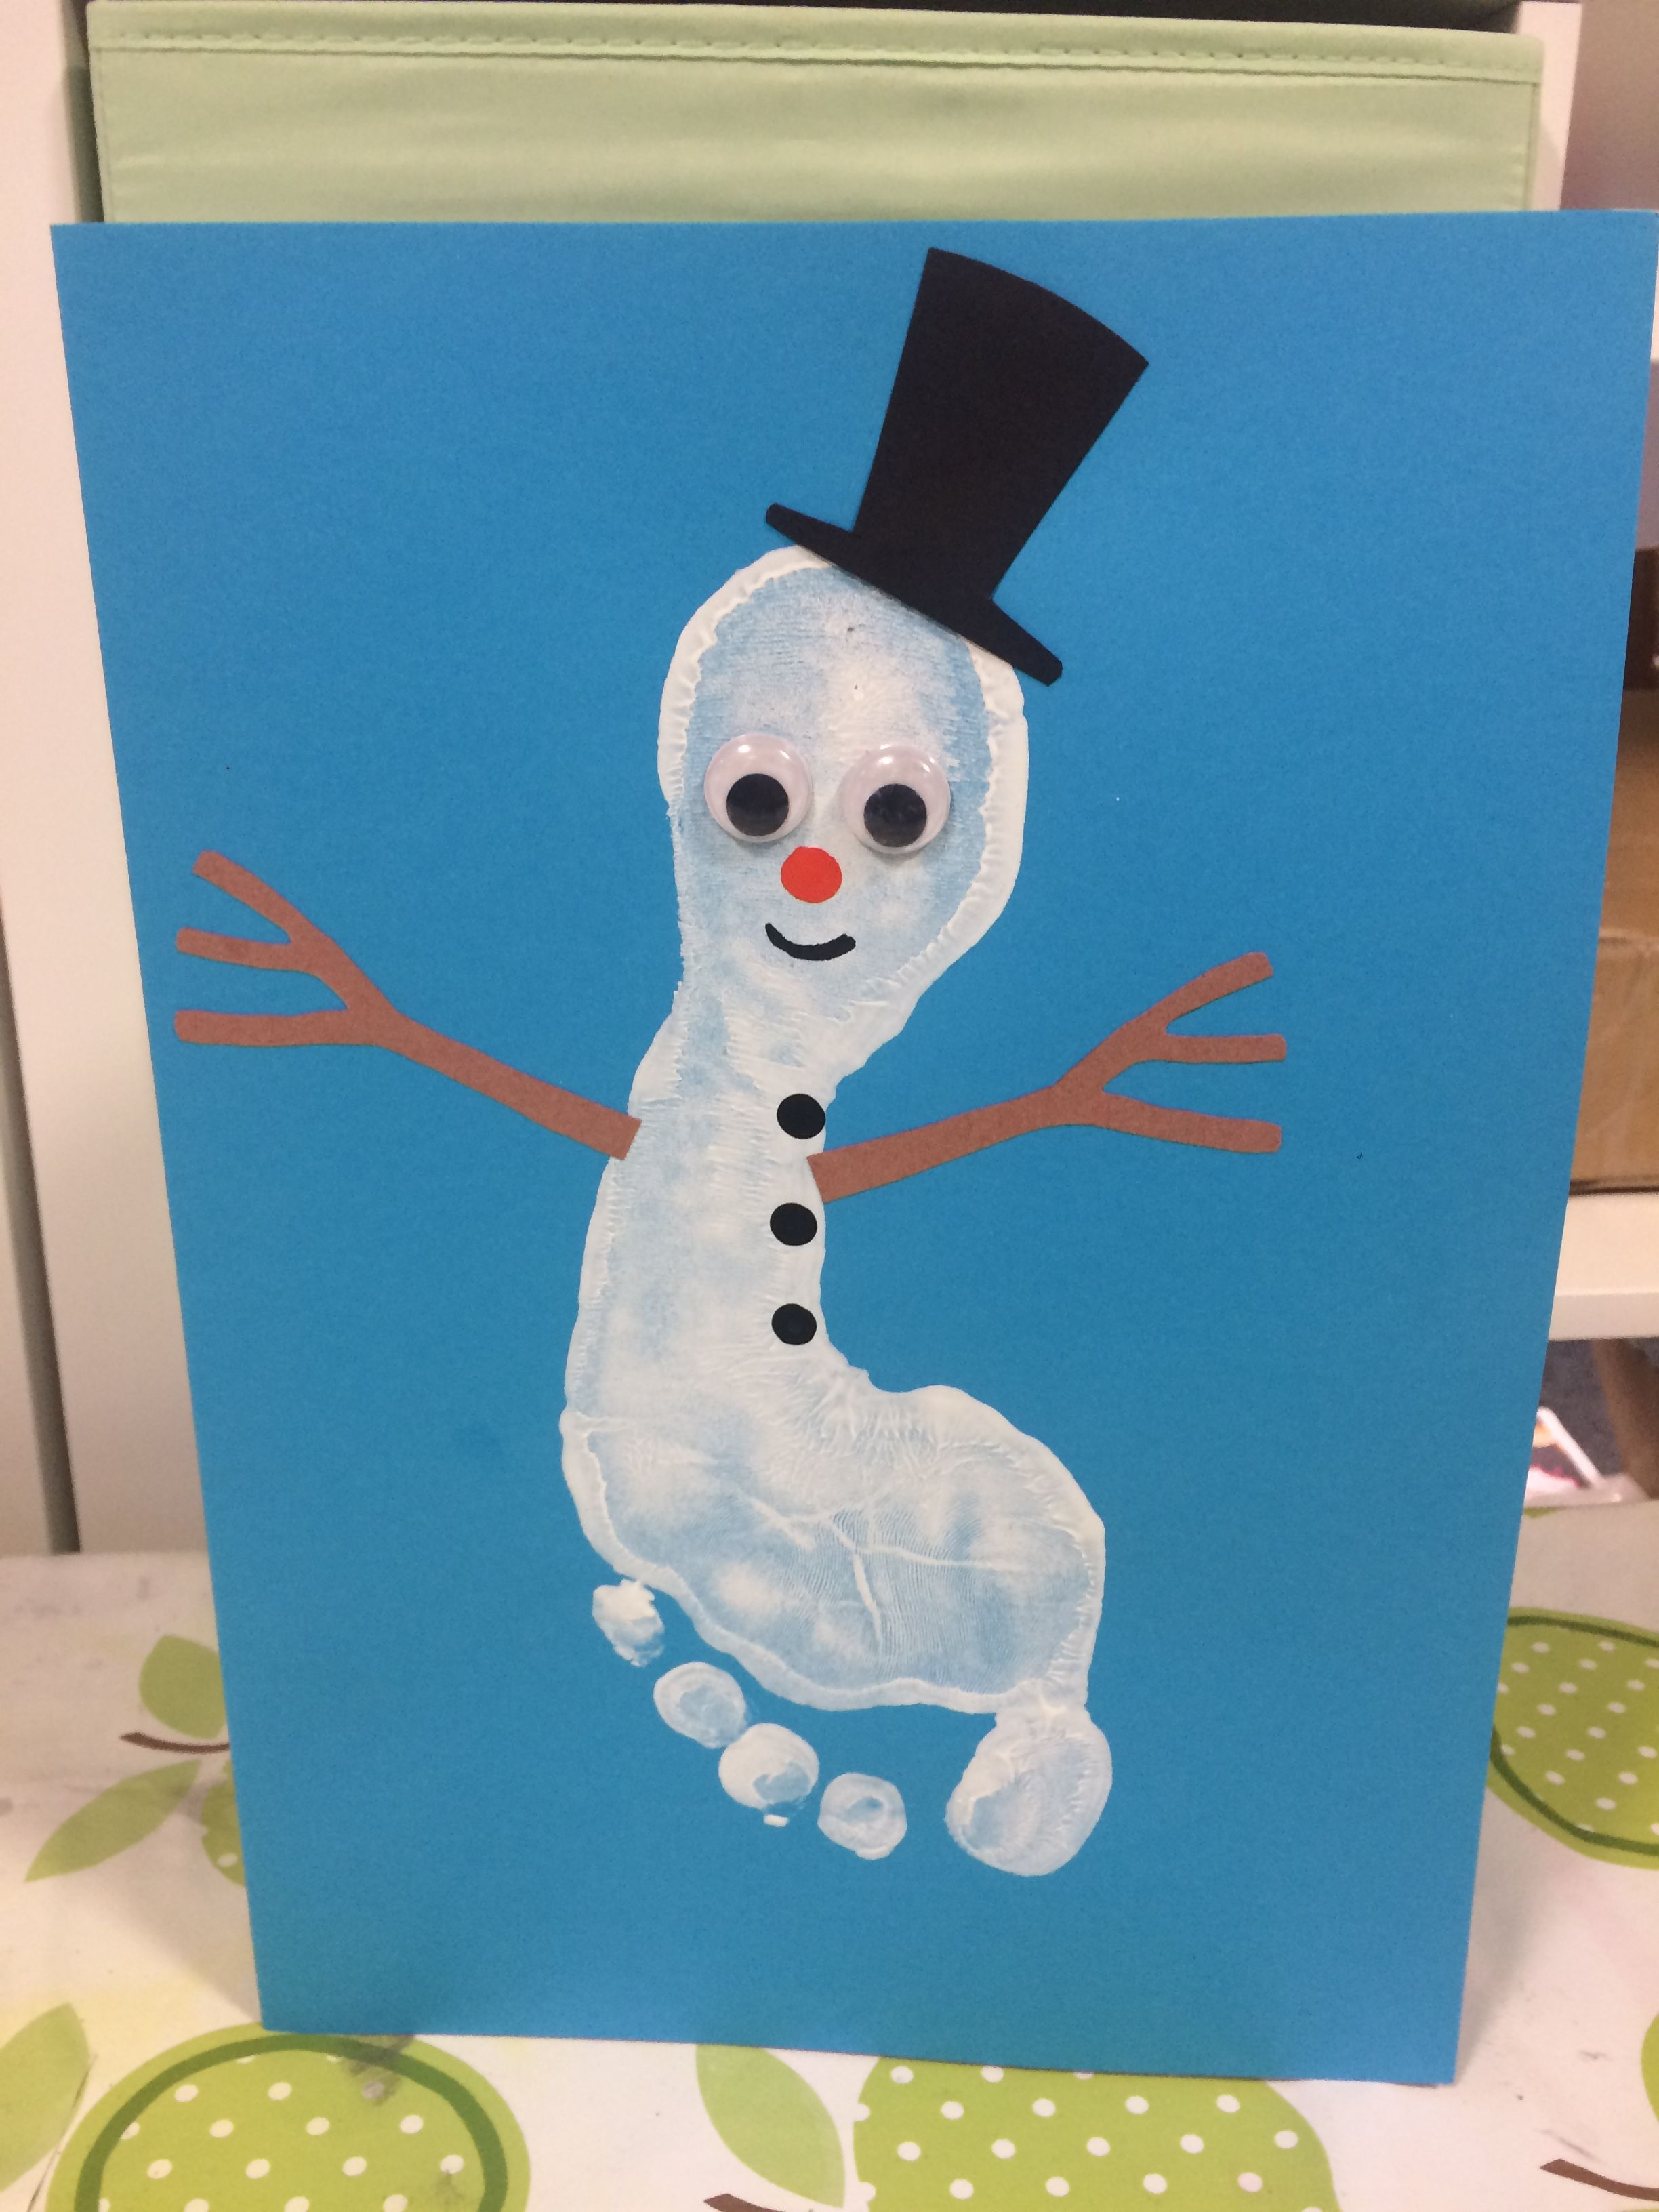 20 snowman crafts footprint ideas